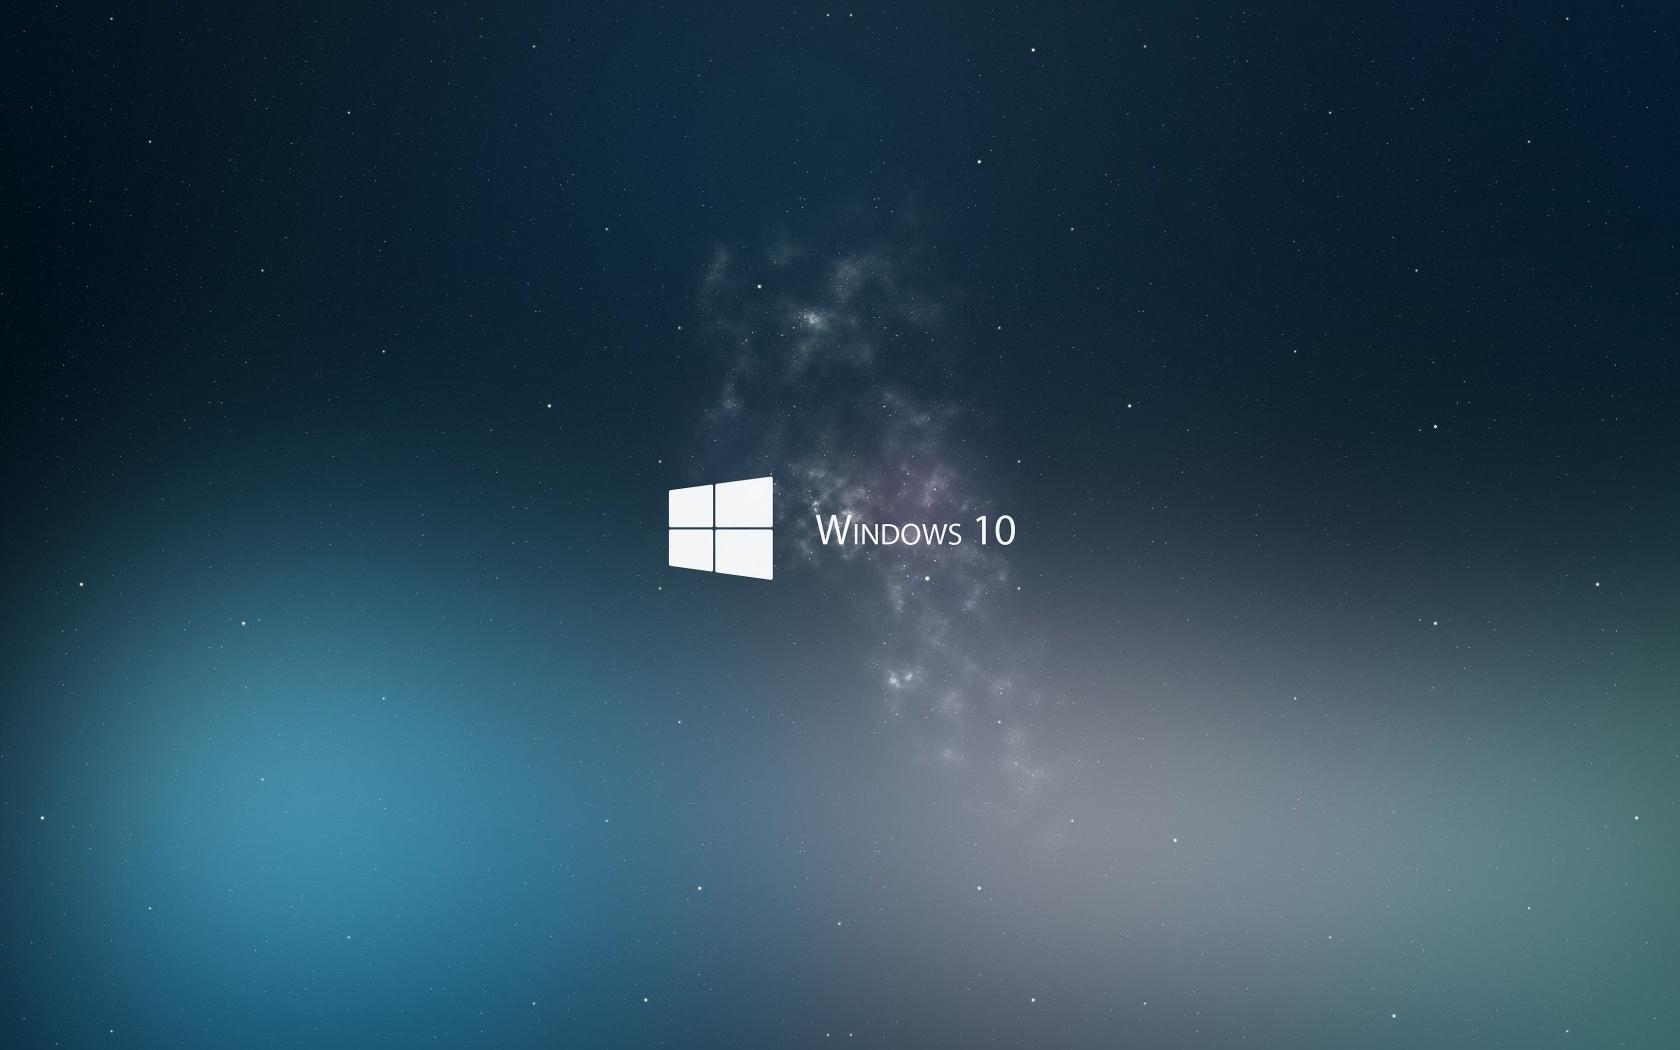 Windows 10 is Coming, Fog, Logo